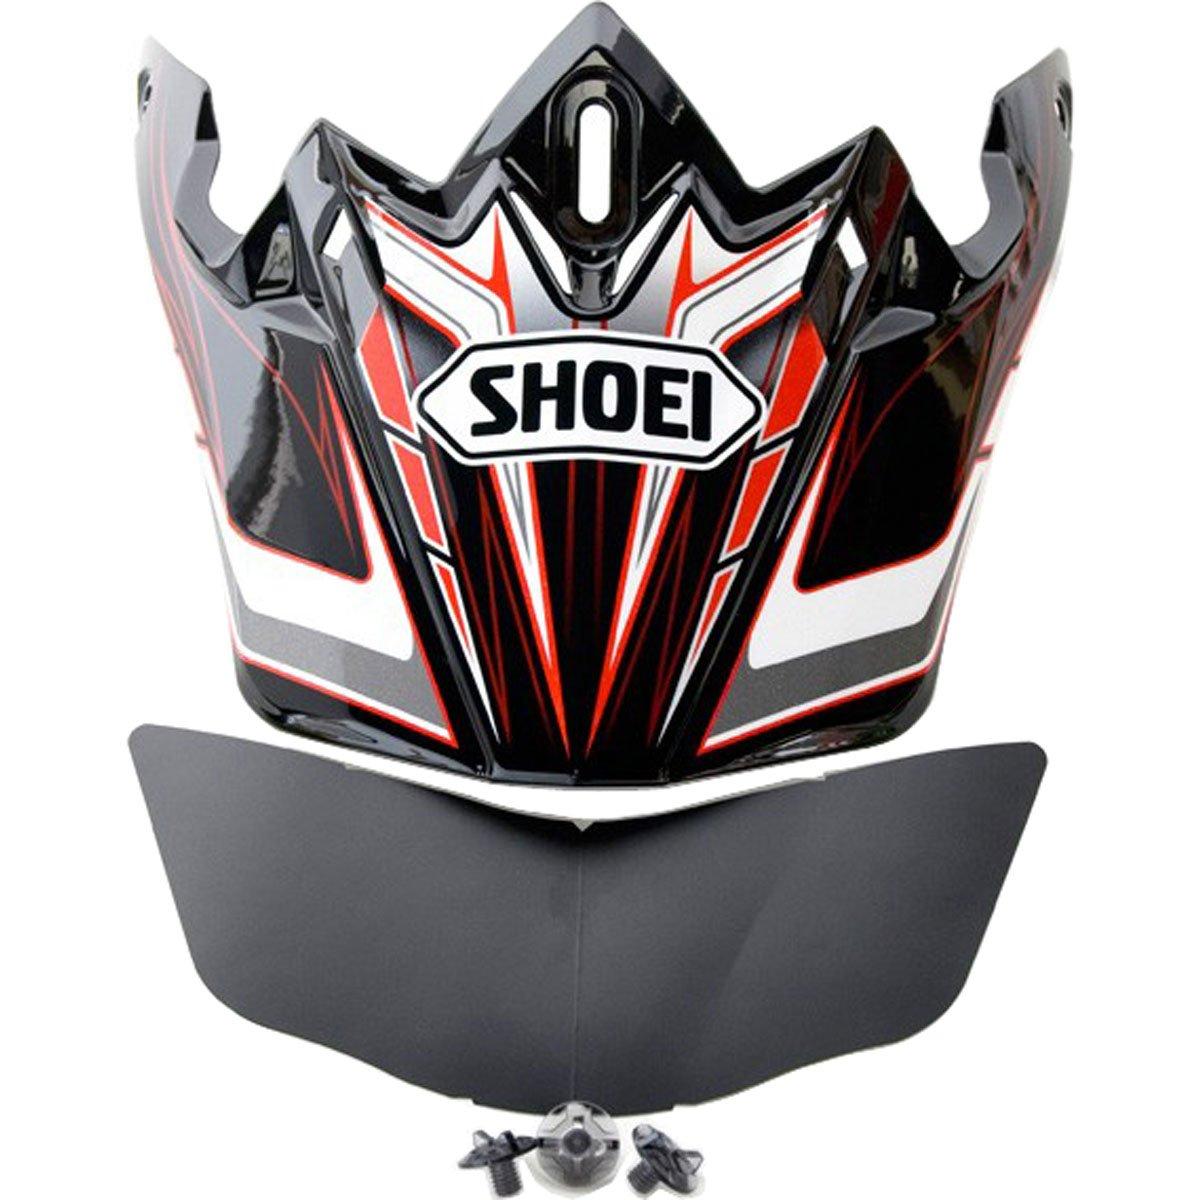 Shoei VFX-W Sleek Visor Malice Off-Road Motorcycle Helmet Accessories - TC-1 / One Size